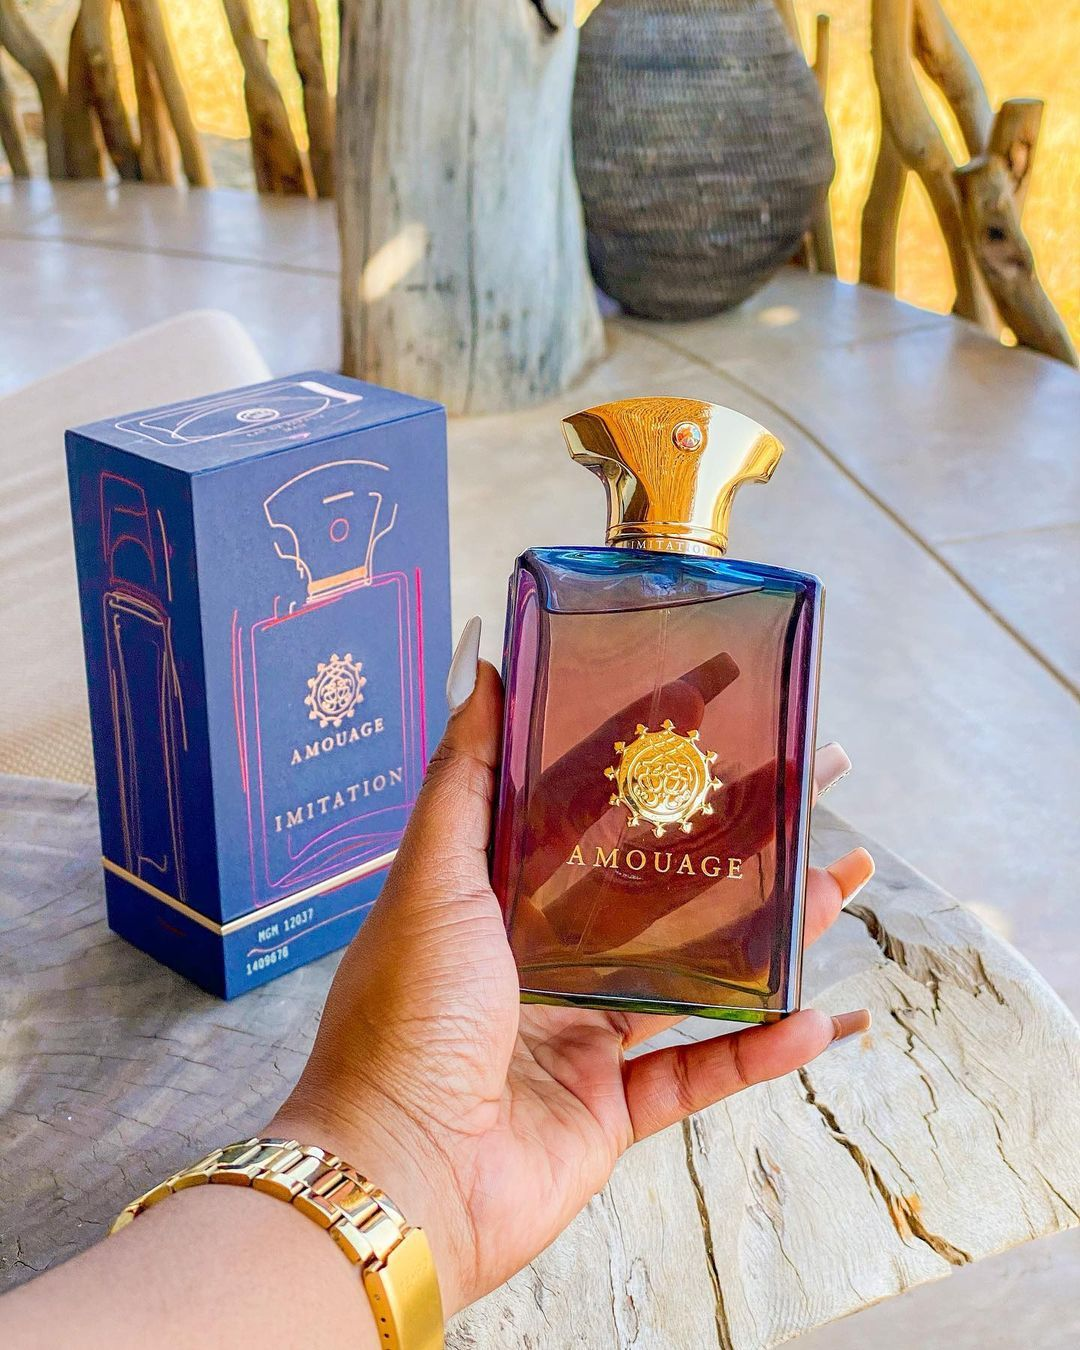 230 Perfume gift sets ideas in 2021   perfume gift sets, perfume, perfume  gift